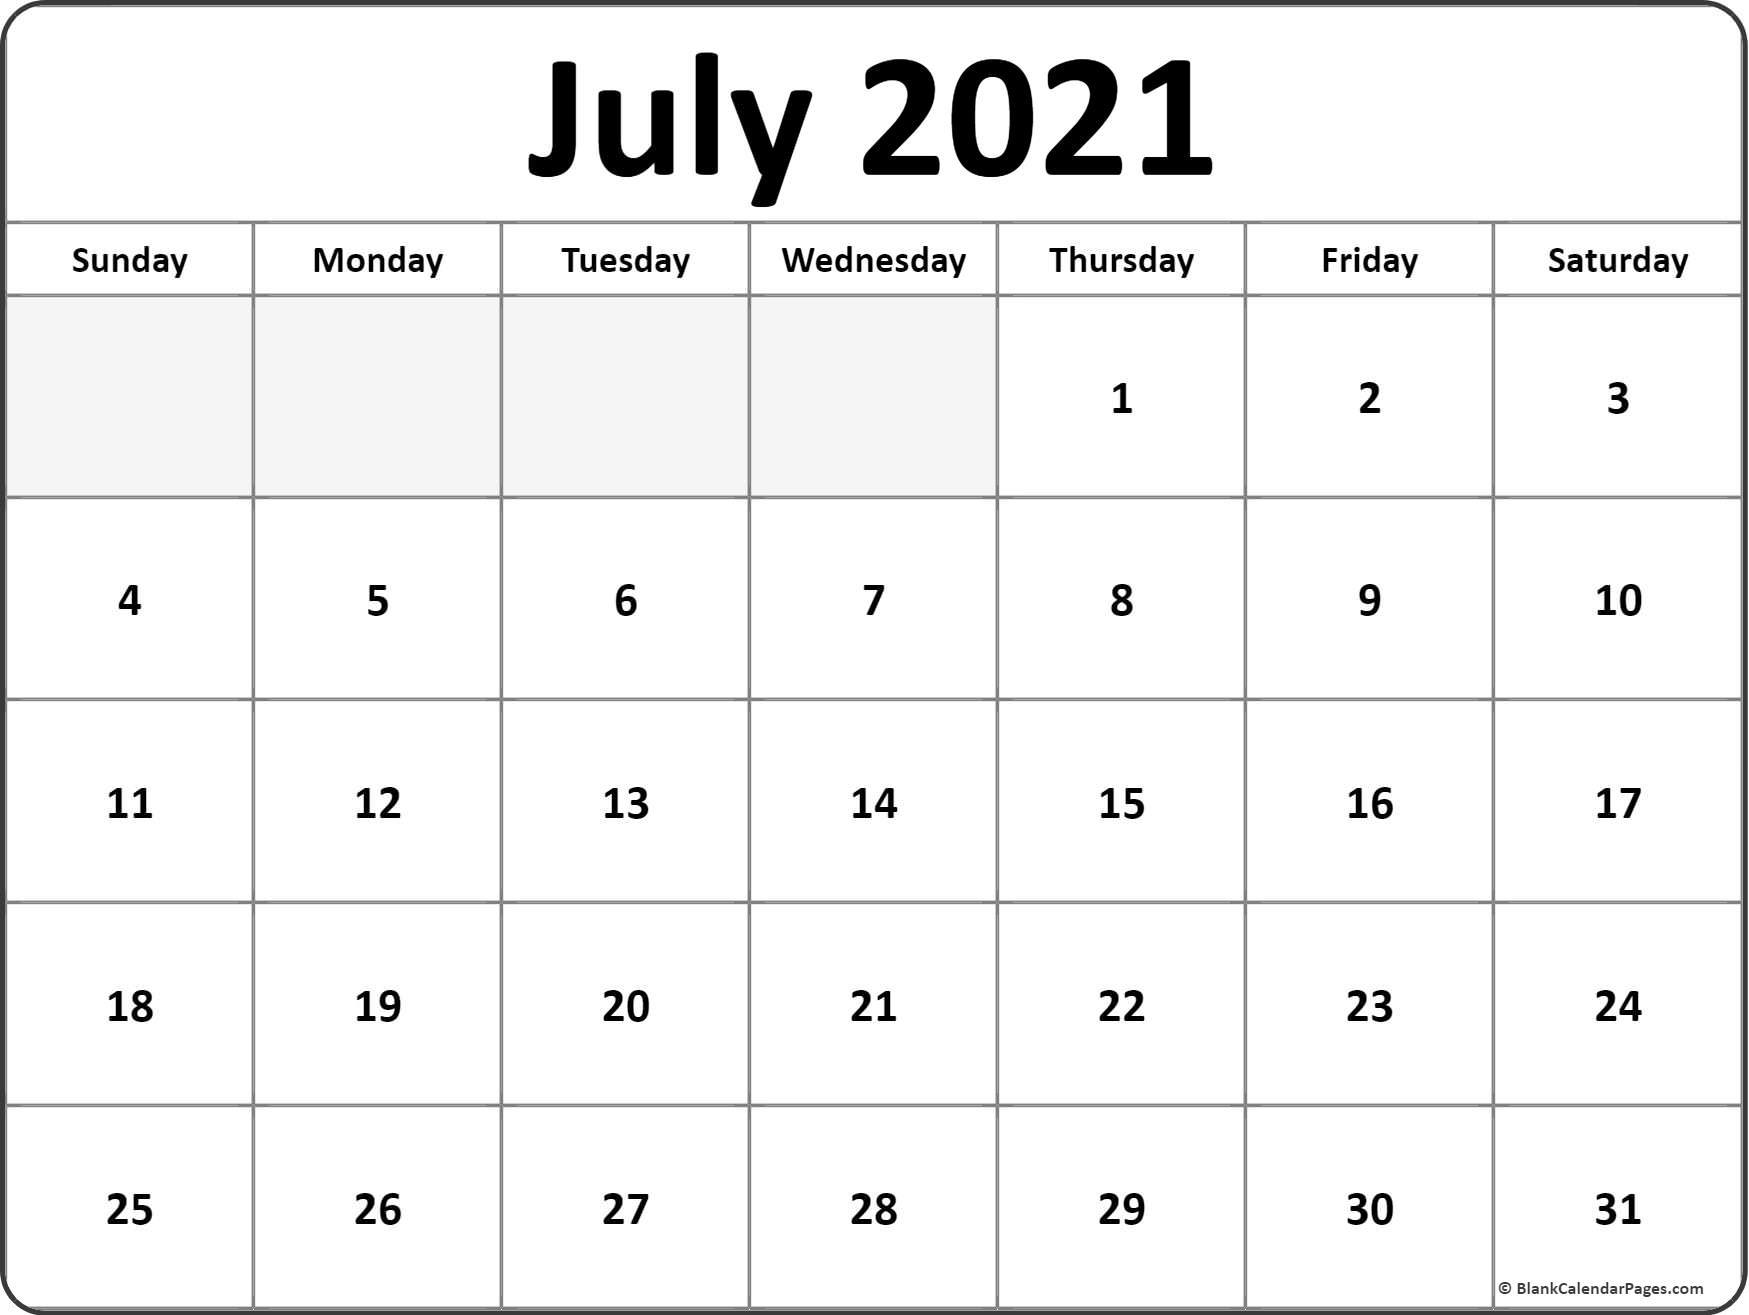 July 2021 Blank Calendar Templates.